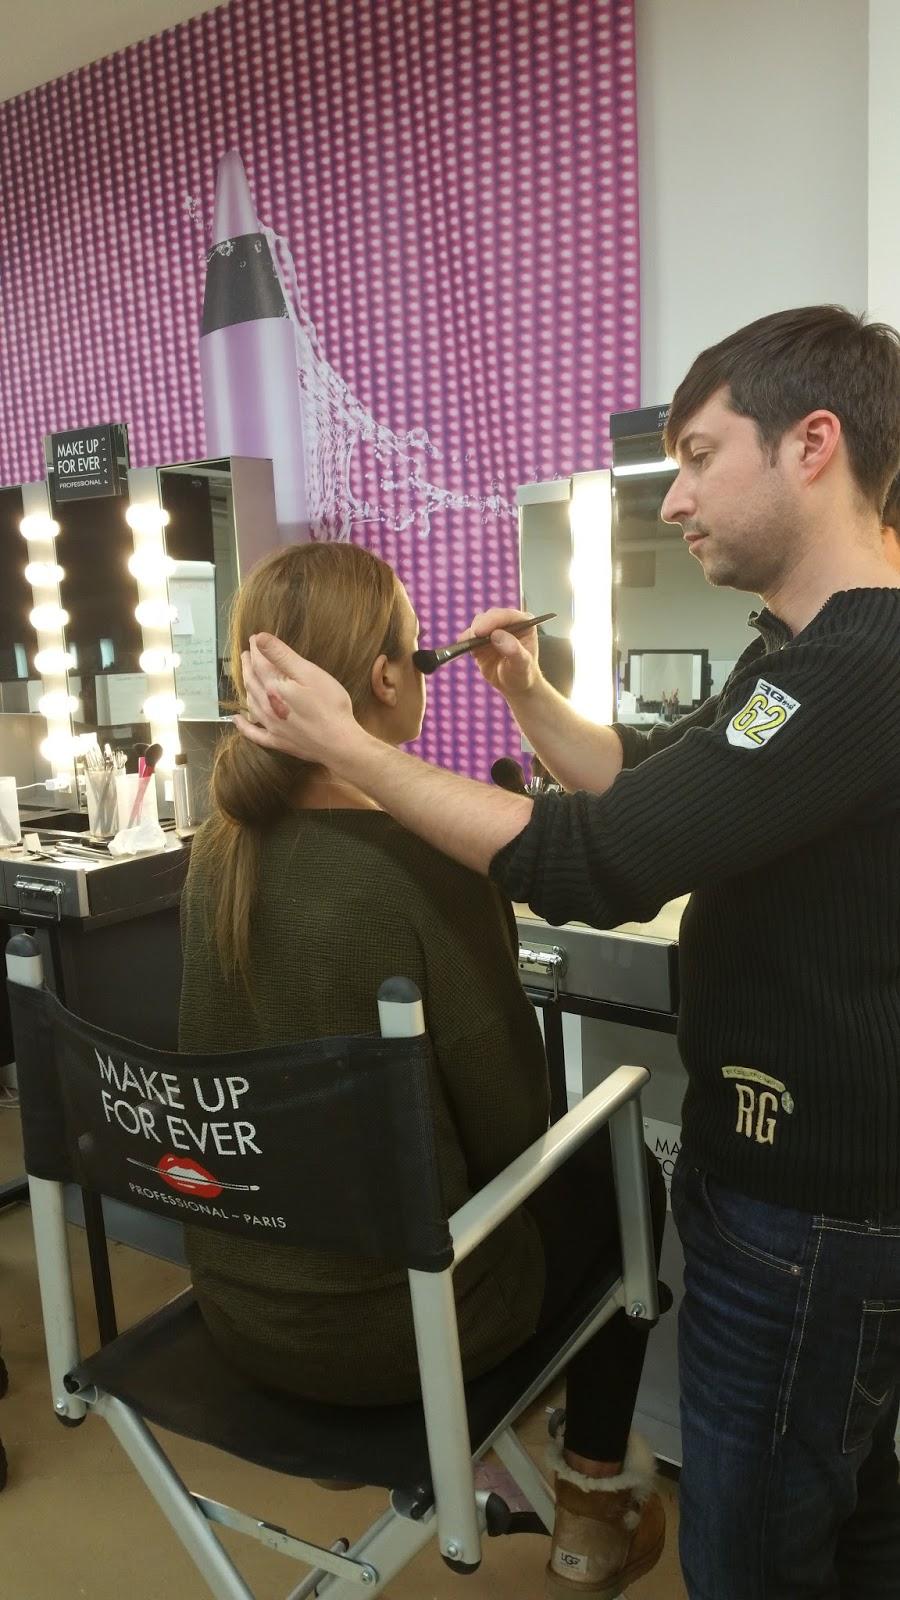 Annonce emploi coiffure paris